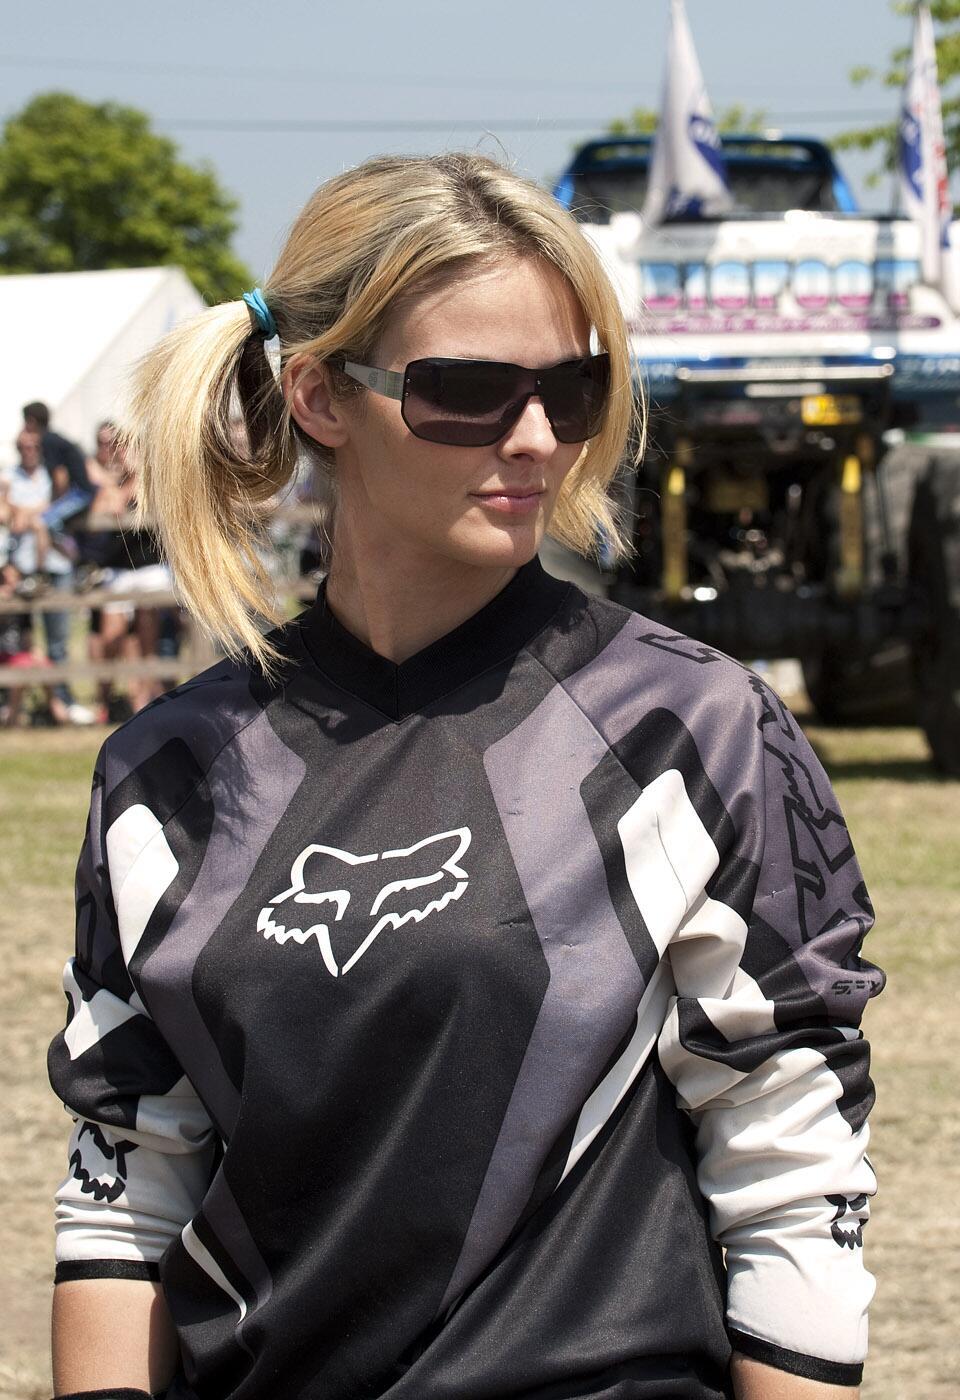 lisa kelly  twitter   wrong  motocross gear teamlisa irt httptcouuuwogl